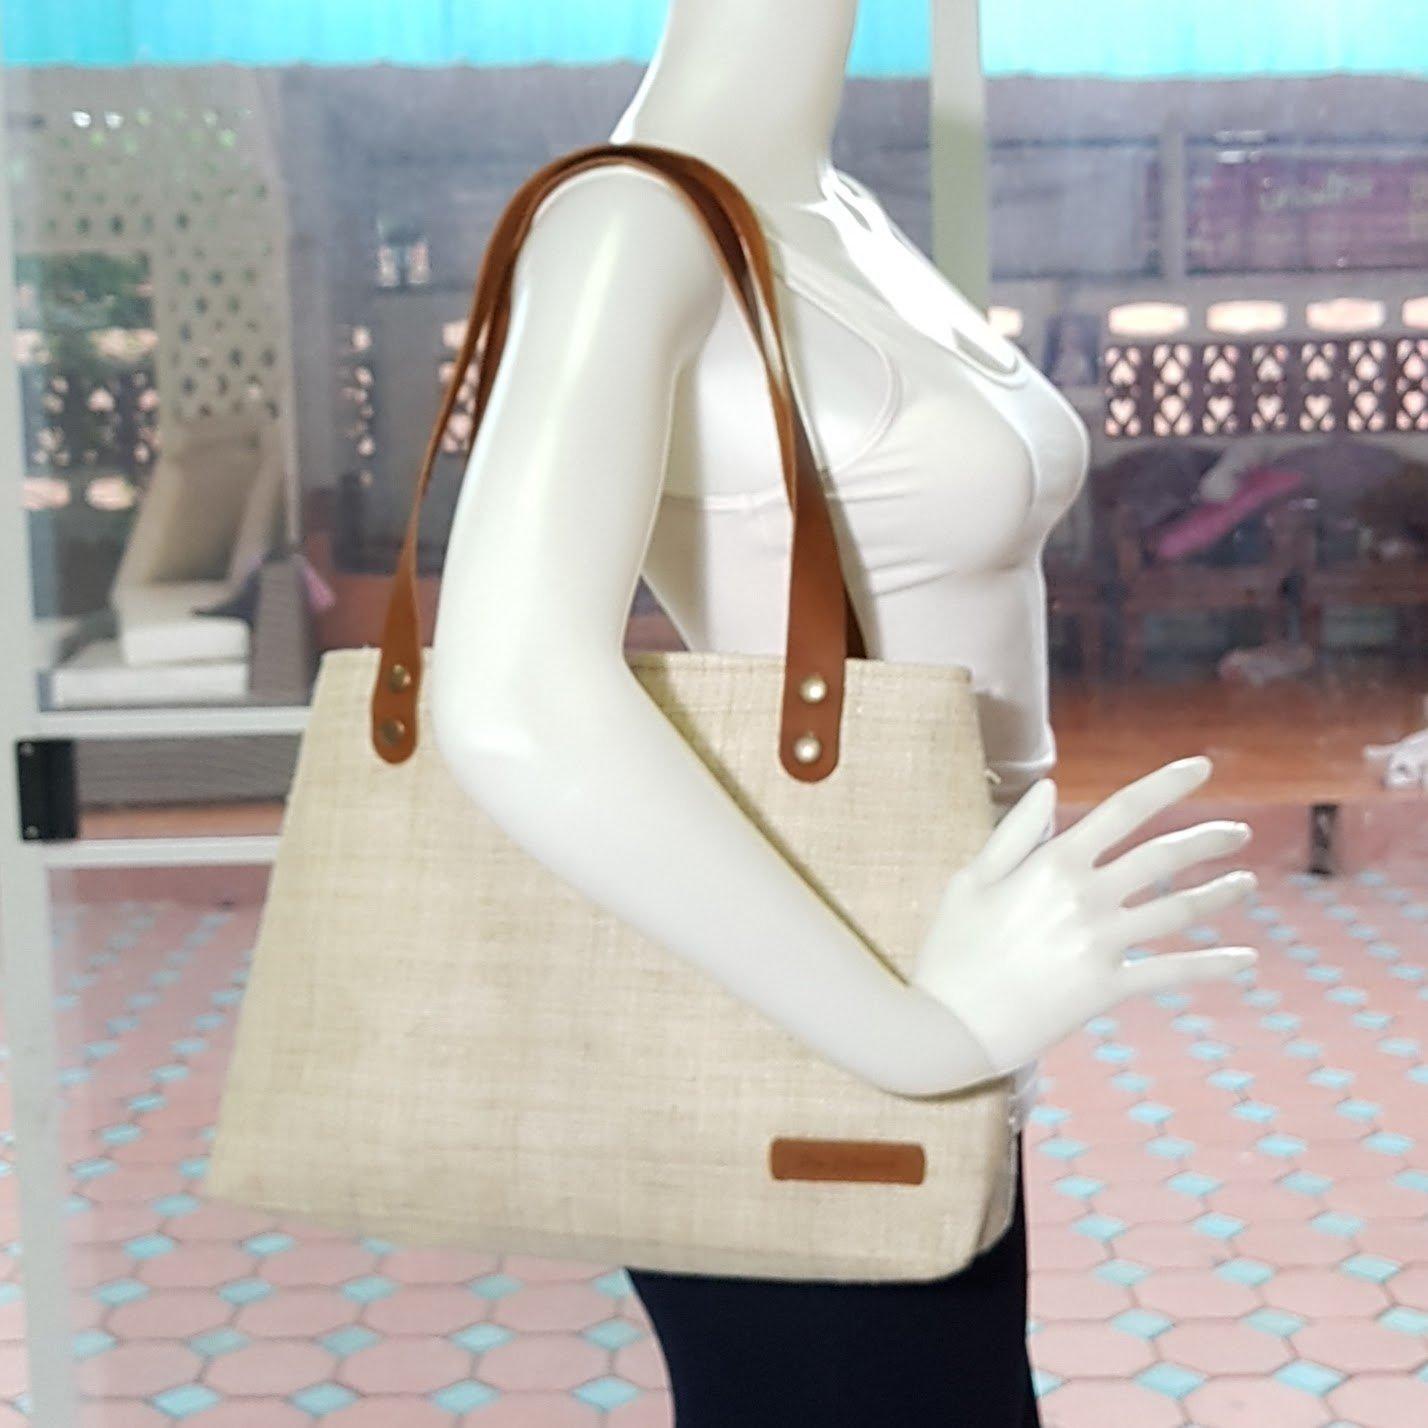 Bohemian / Handbags / Purses / Tote bags / Anniversary Gifts / Christmas Gift Ideas / White / Ivory